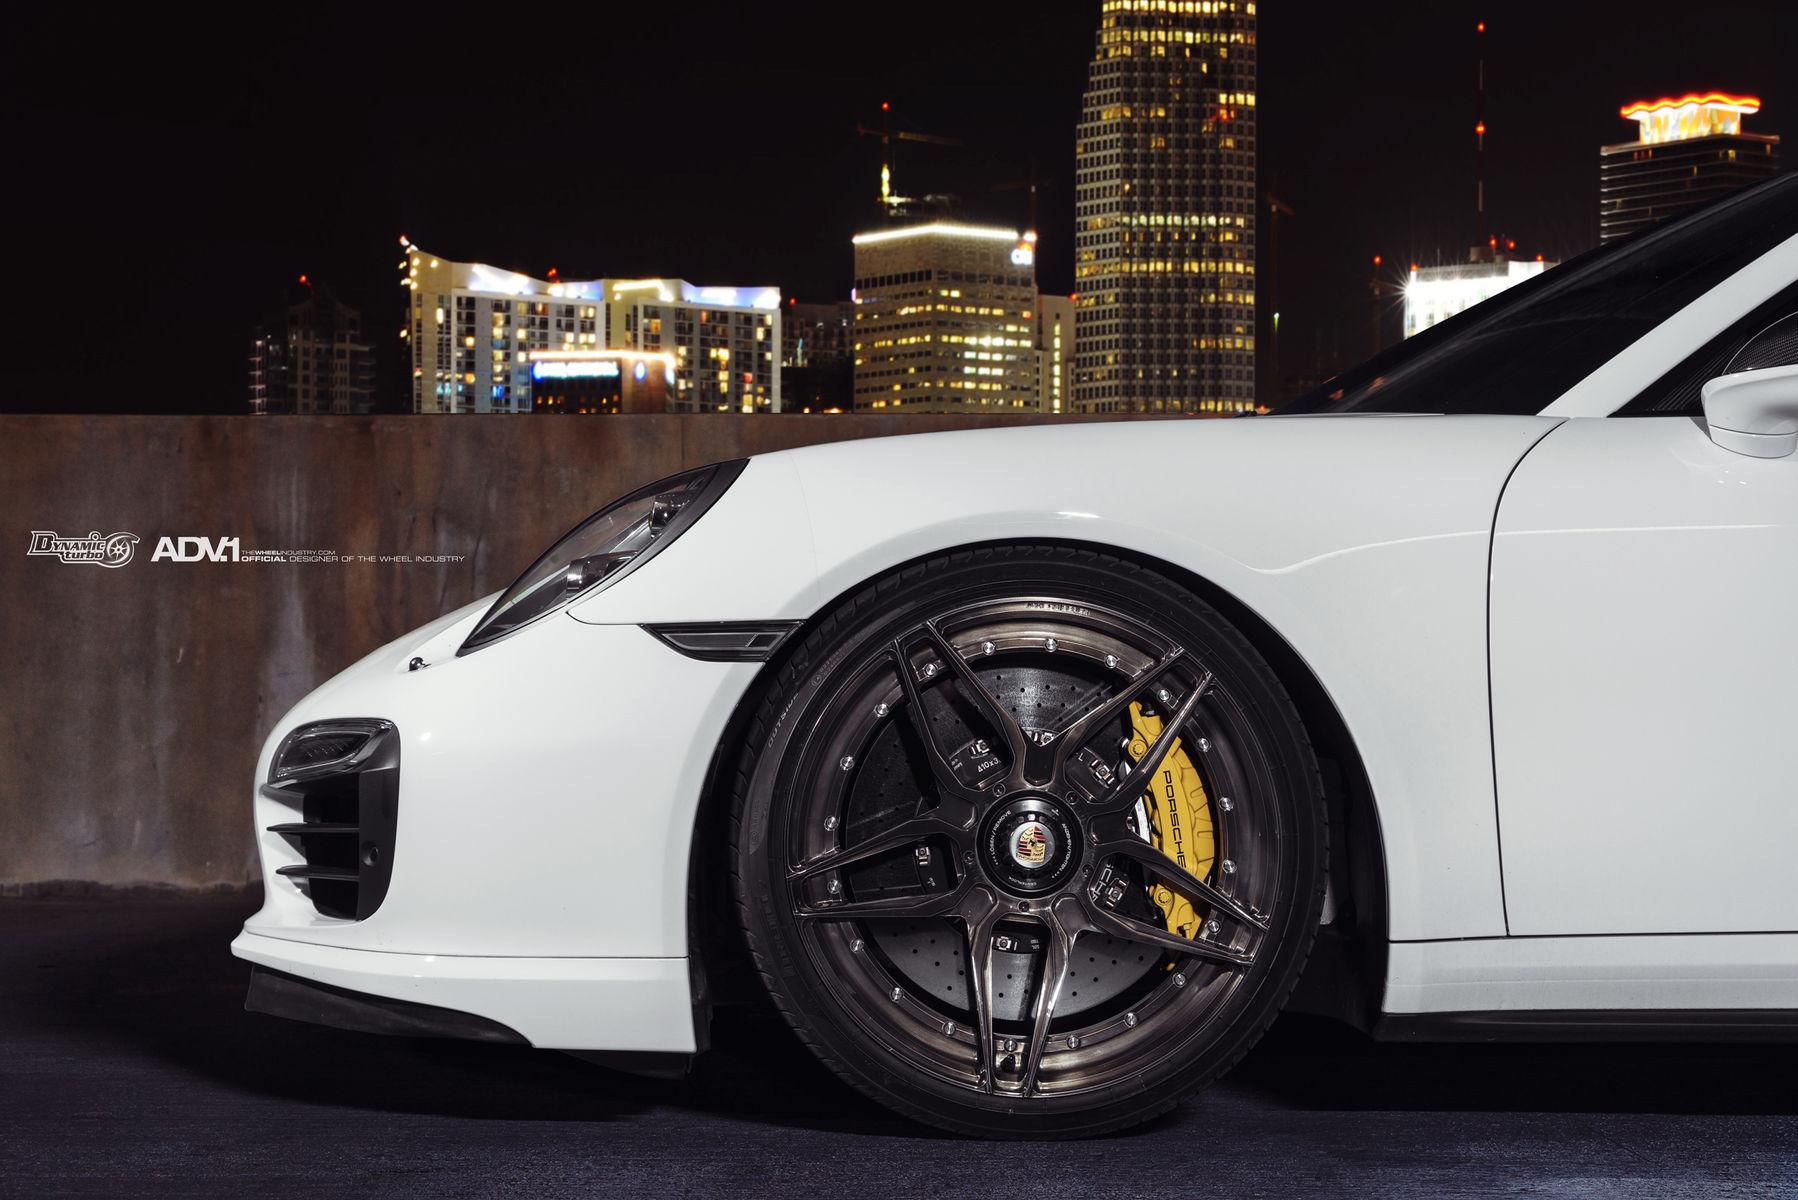 Porsche 911 | Porsche Turbo S